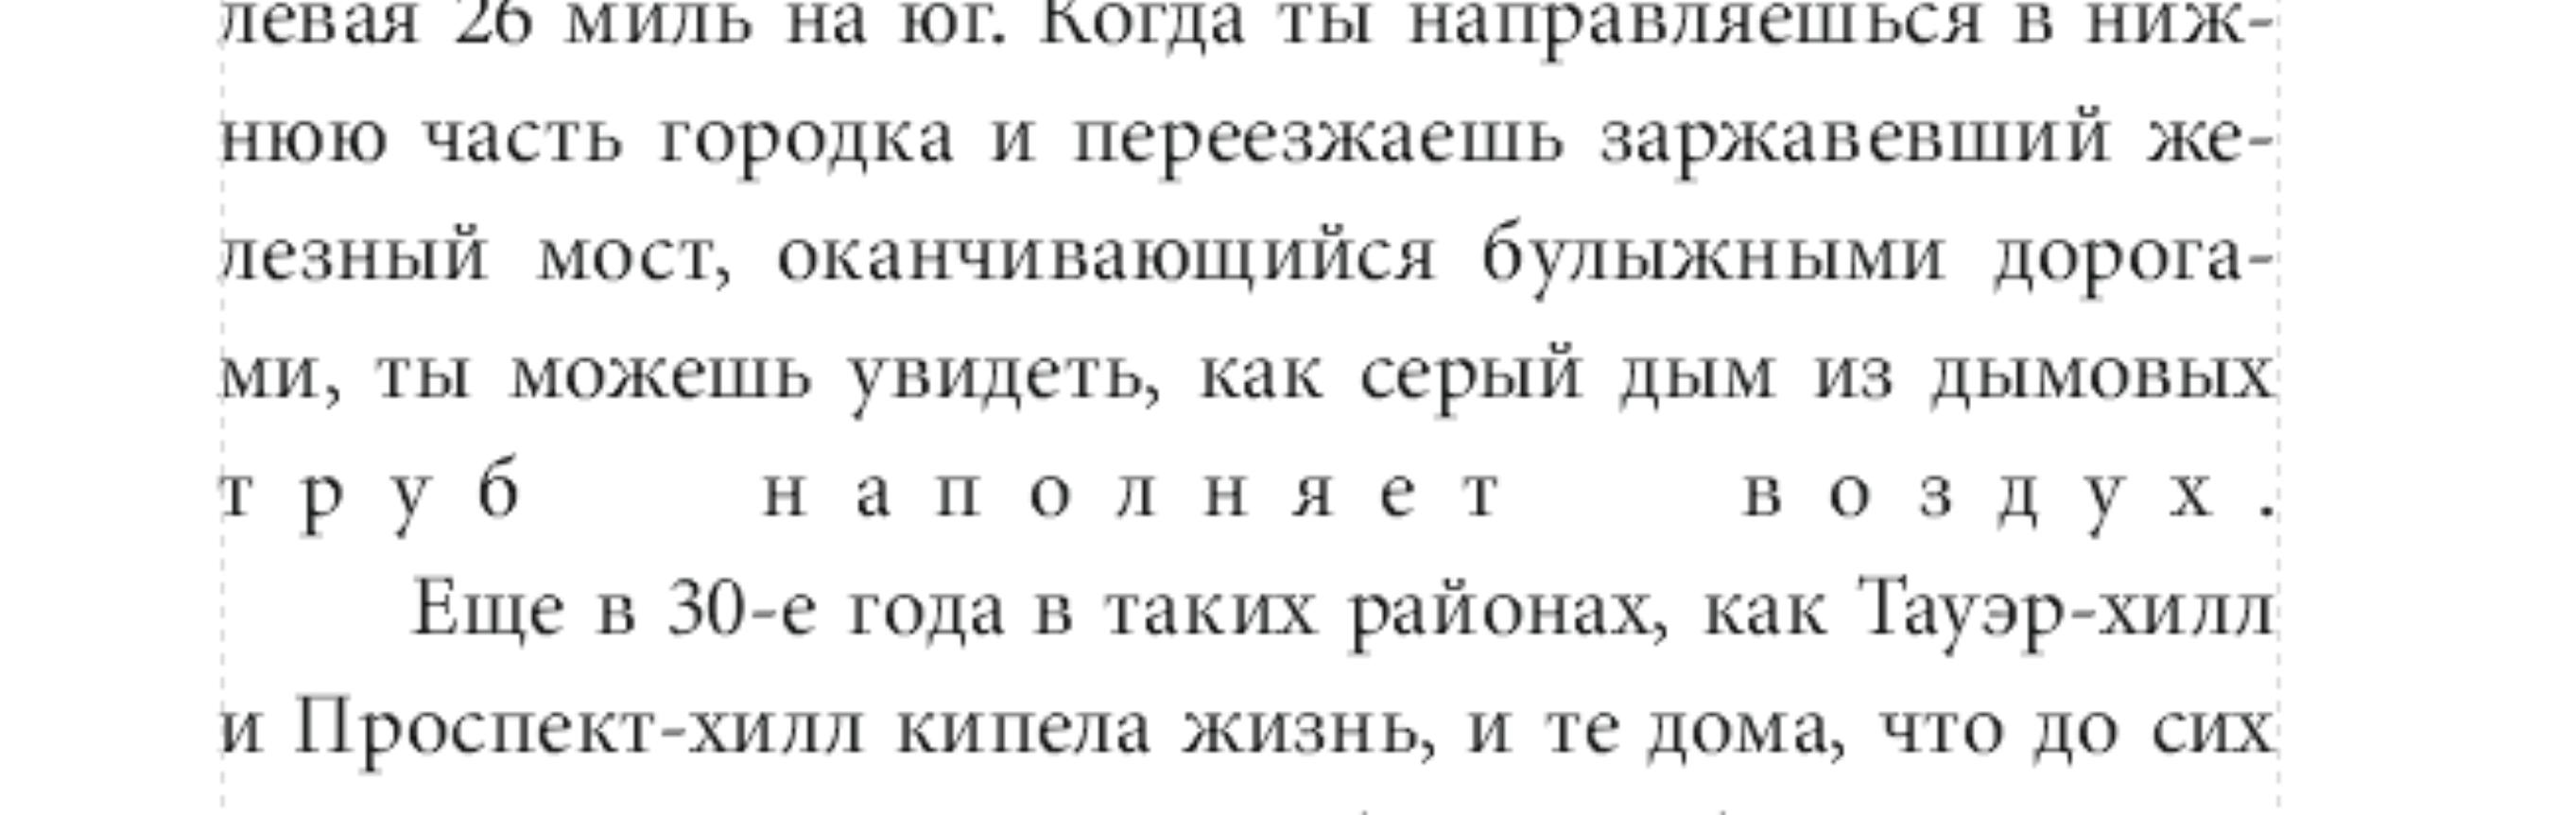 Проблема со шрифтом1.png